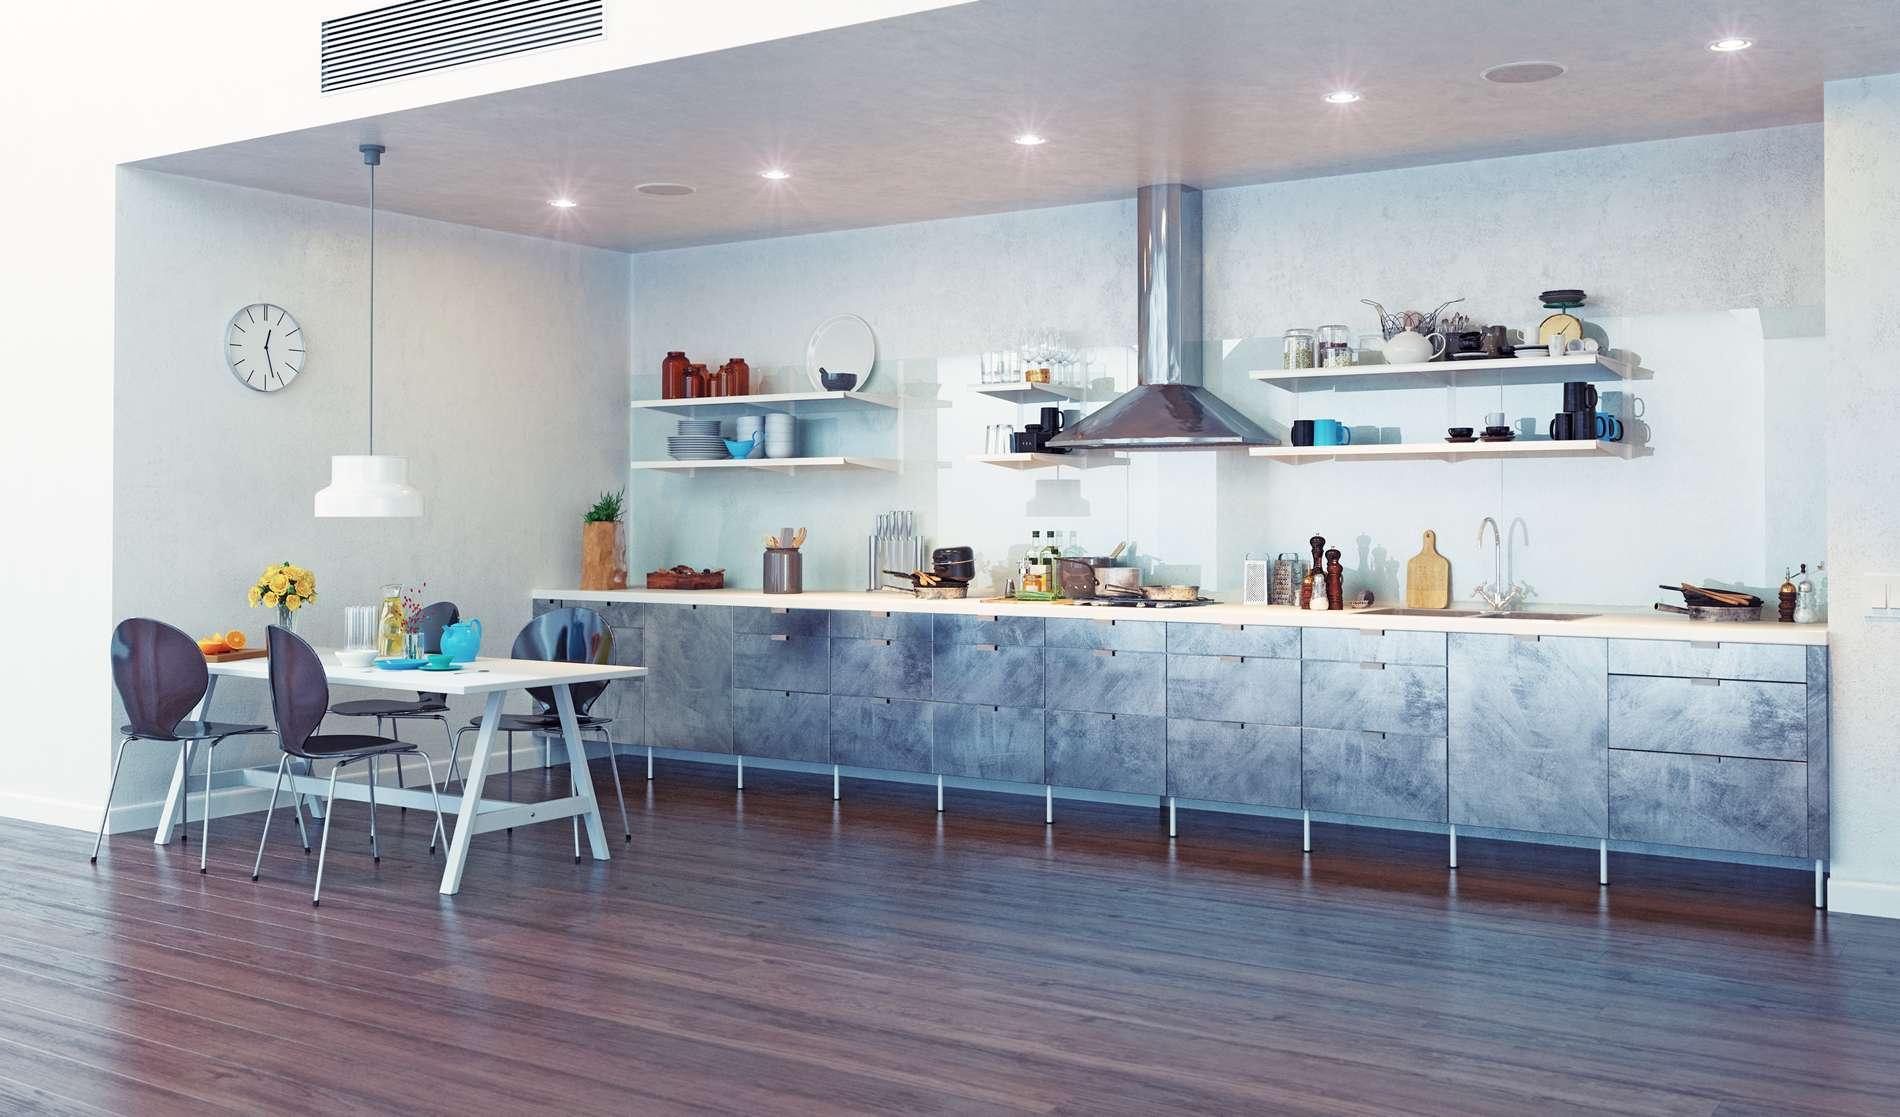 натяжна стеля для кухні